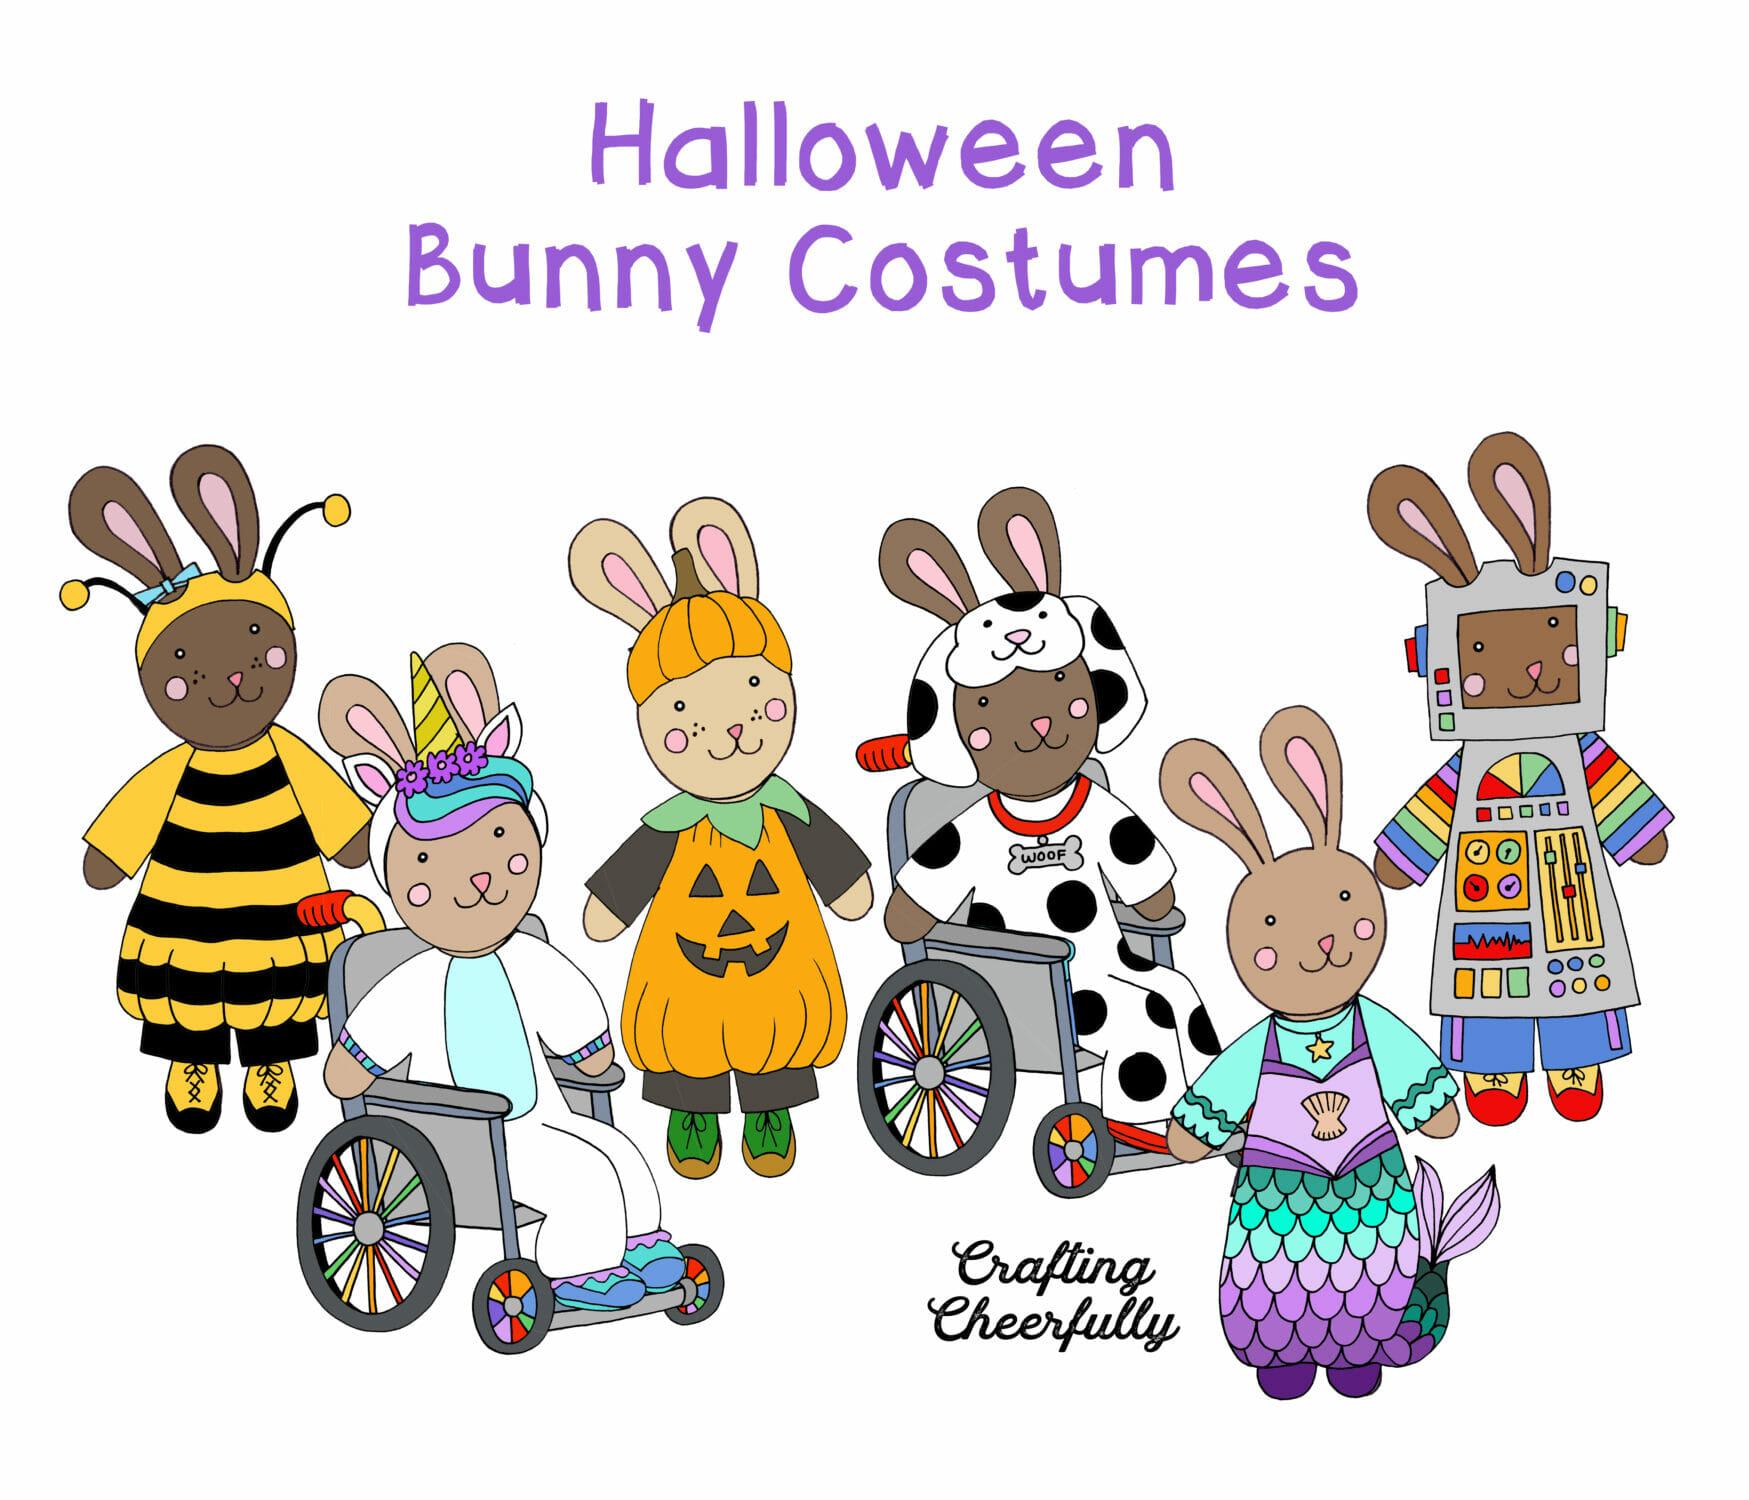 Halloween Bunny Costumes